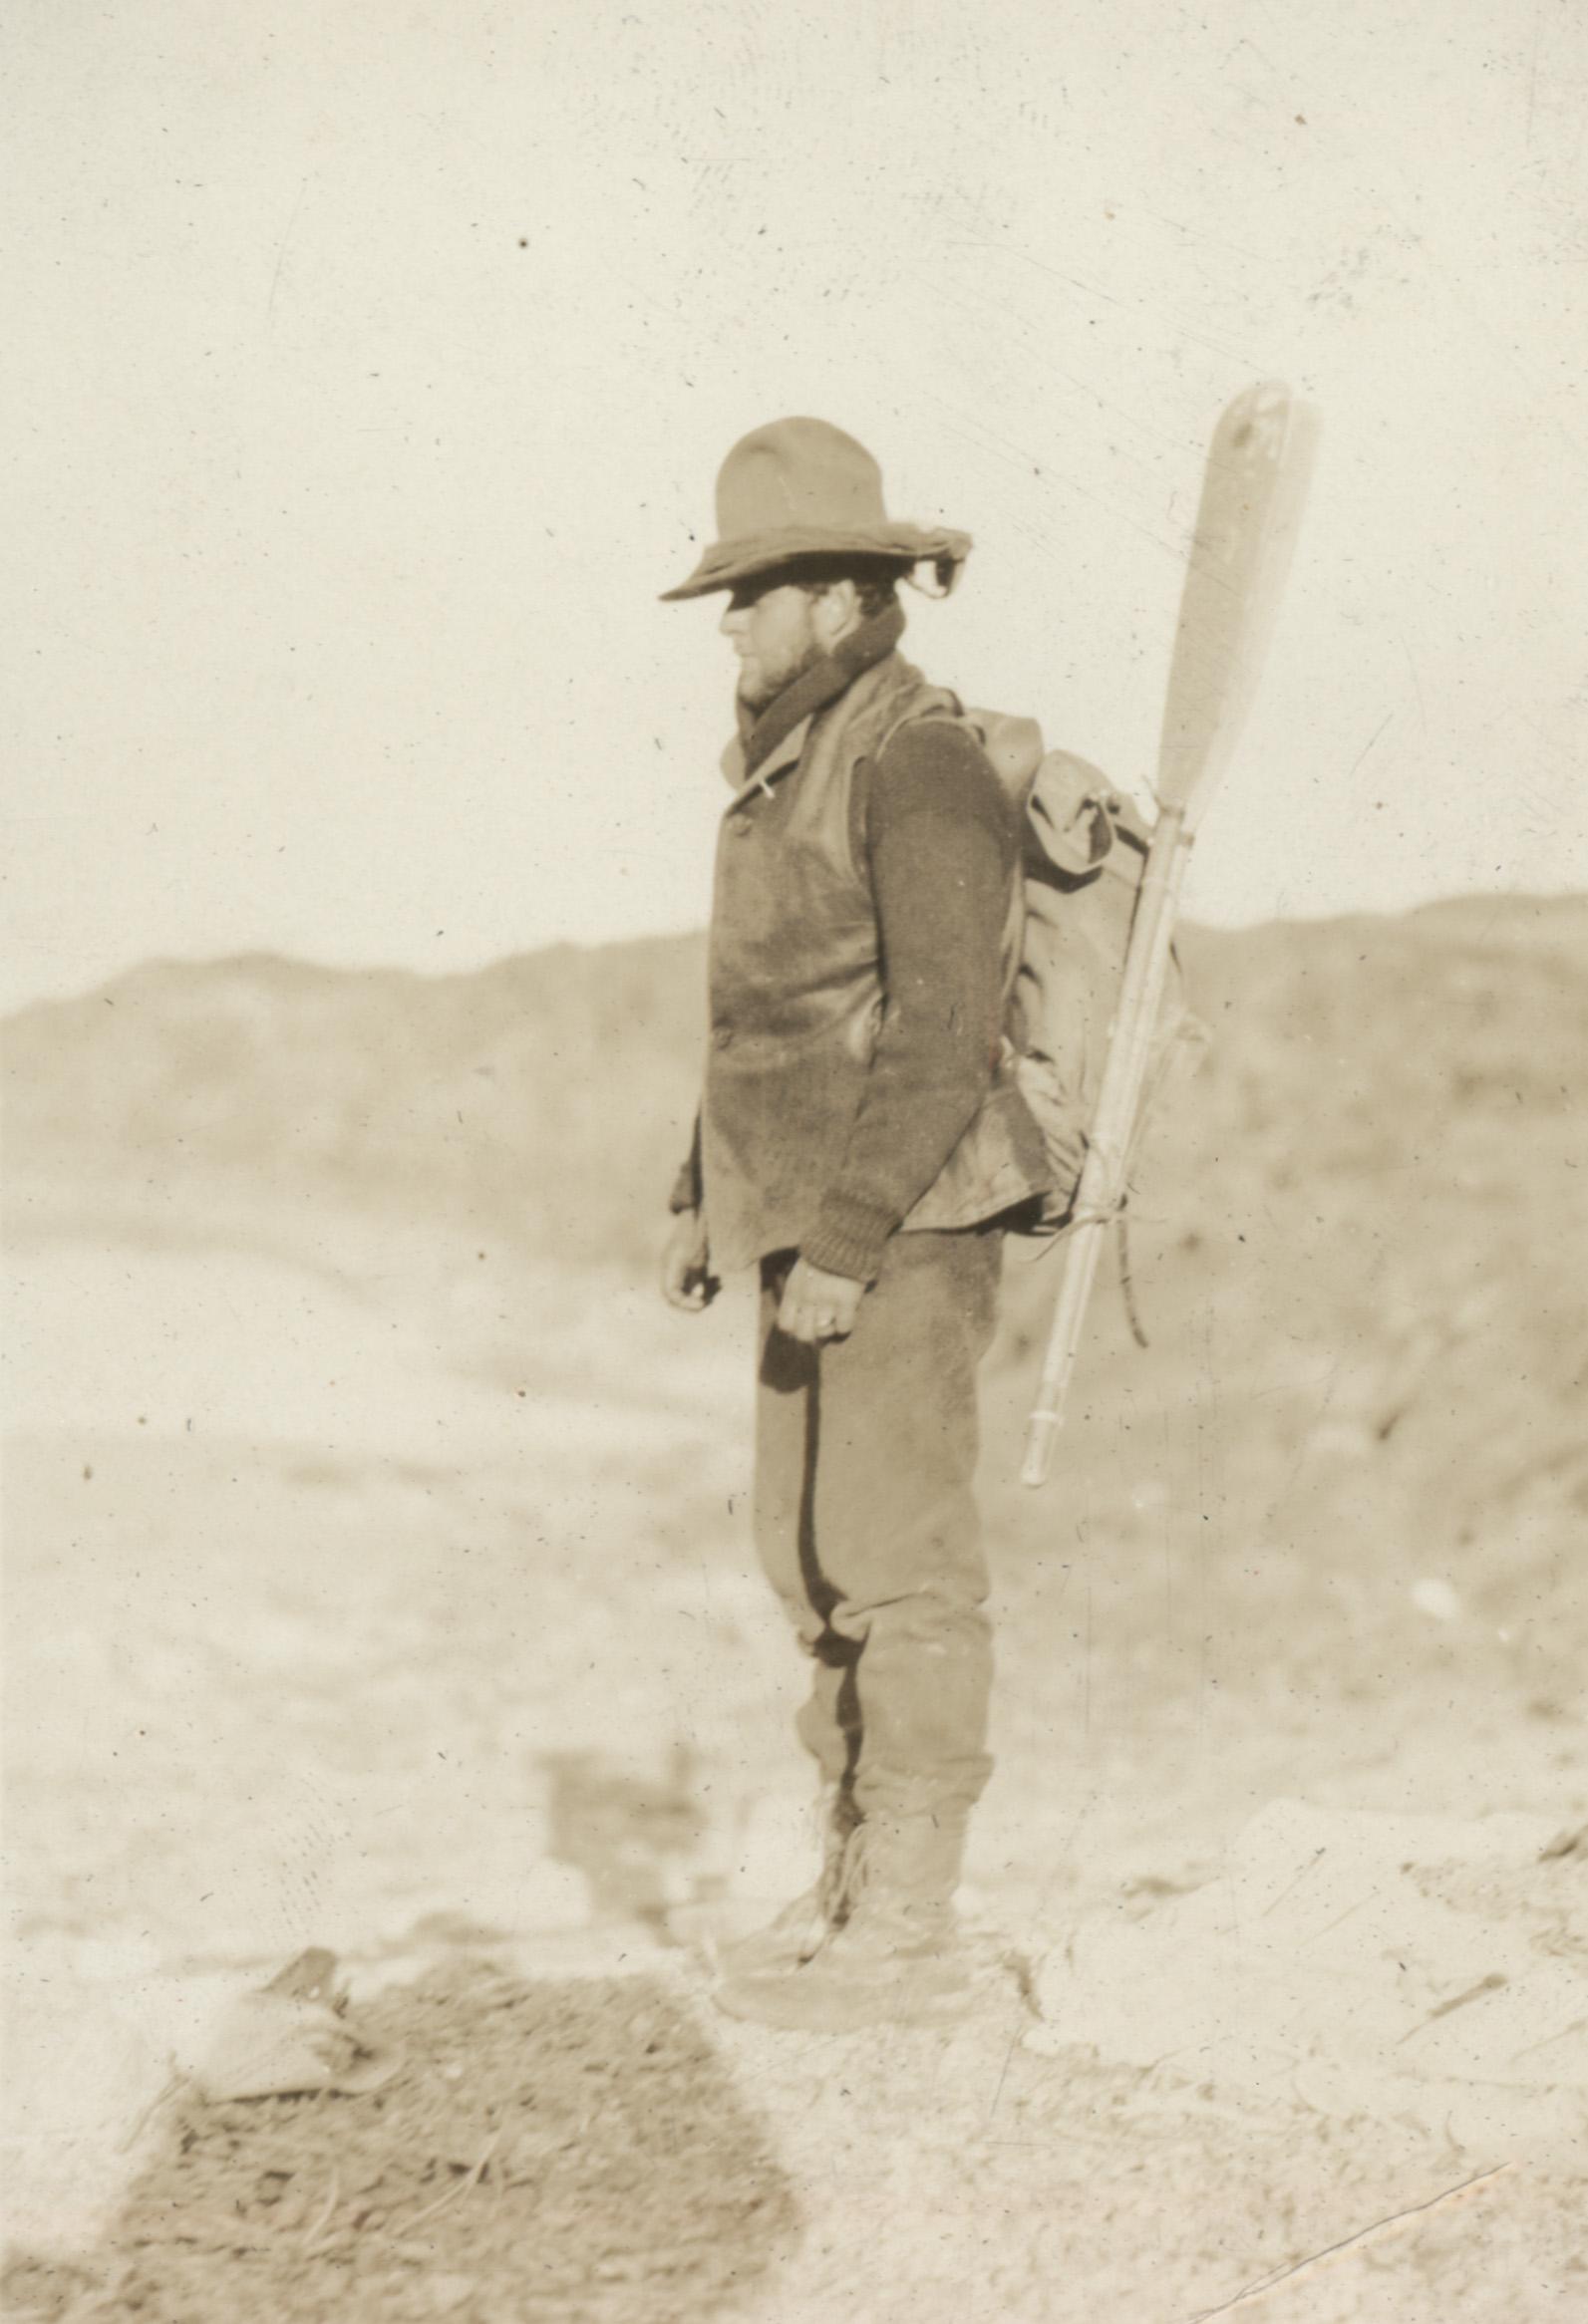 1927 Monroe Grey Barnard with oars and backpack on Baffin Island